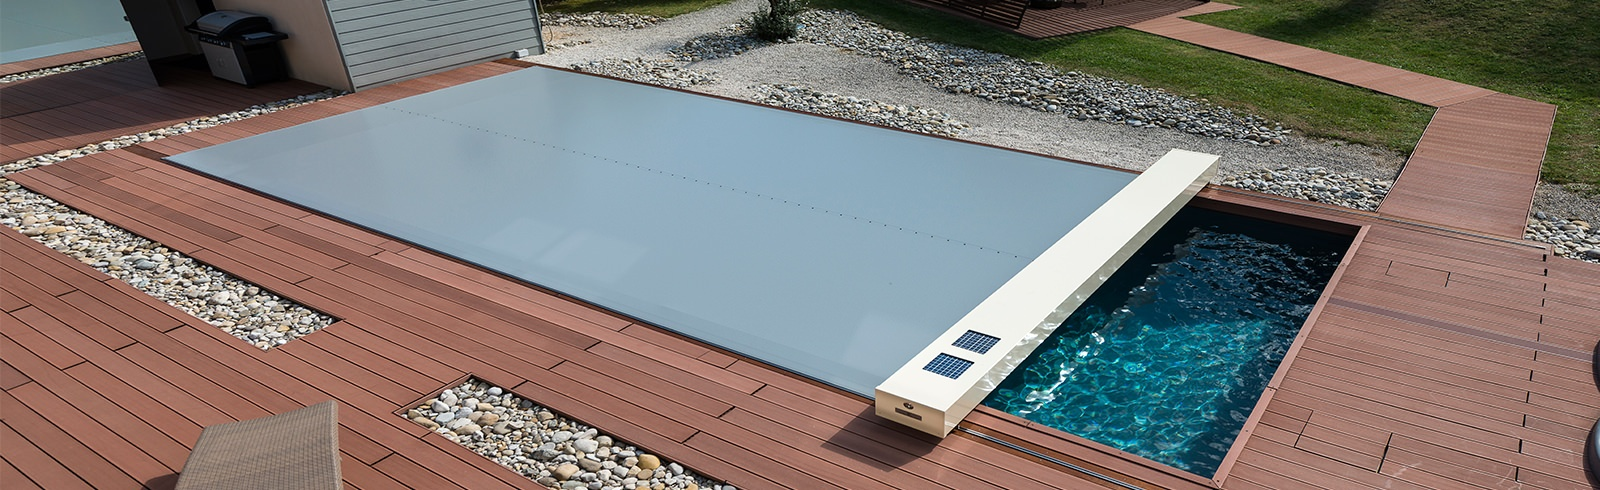 bache piscine 7x5